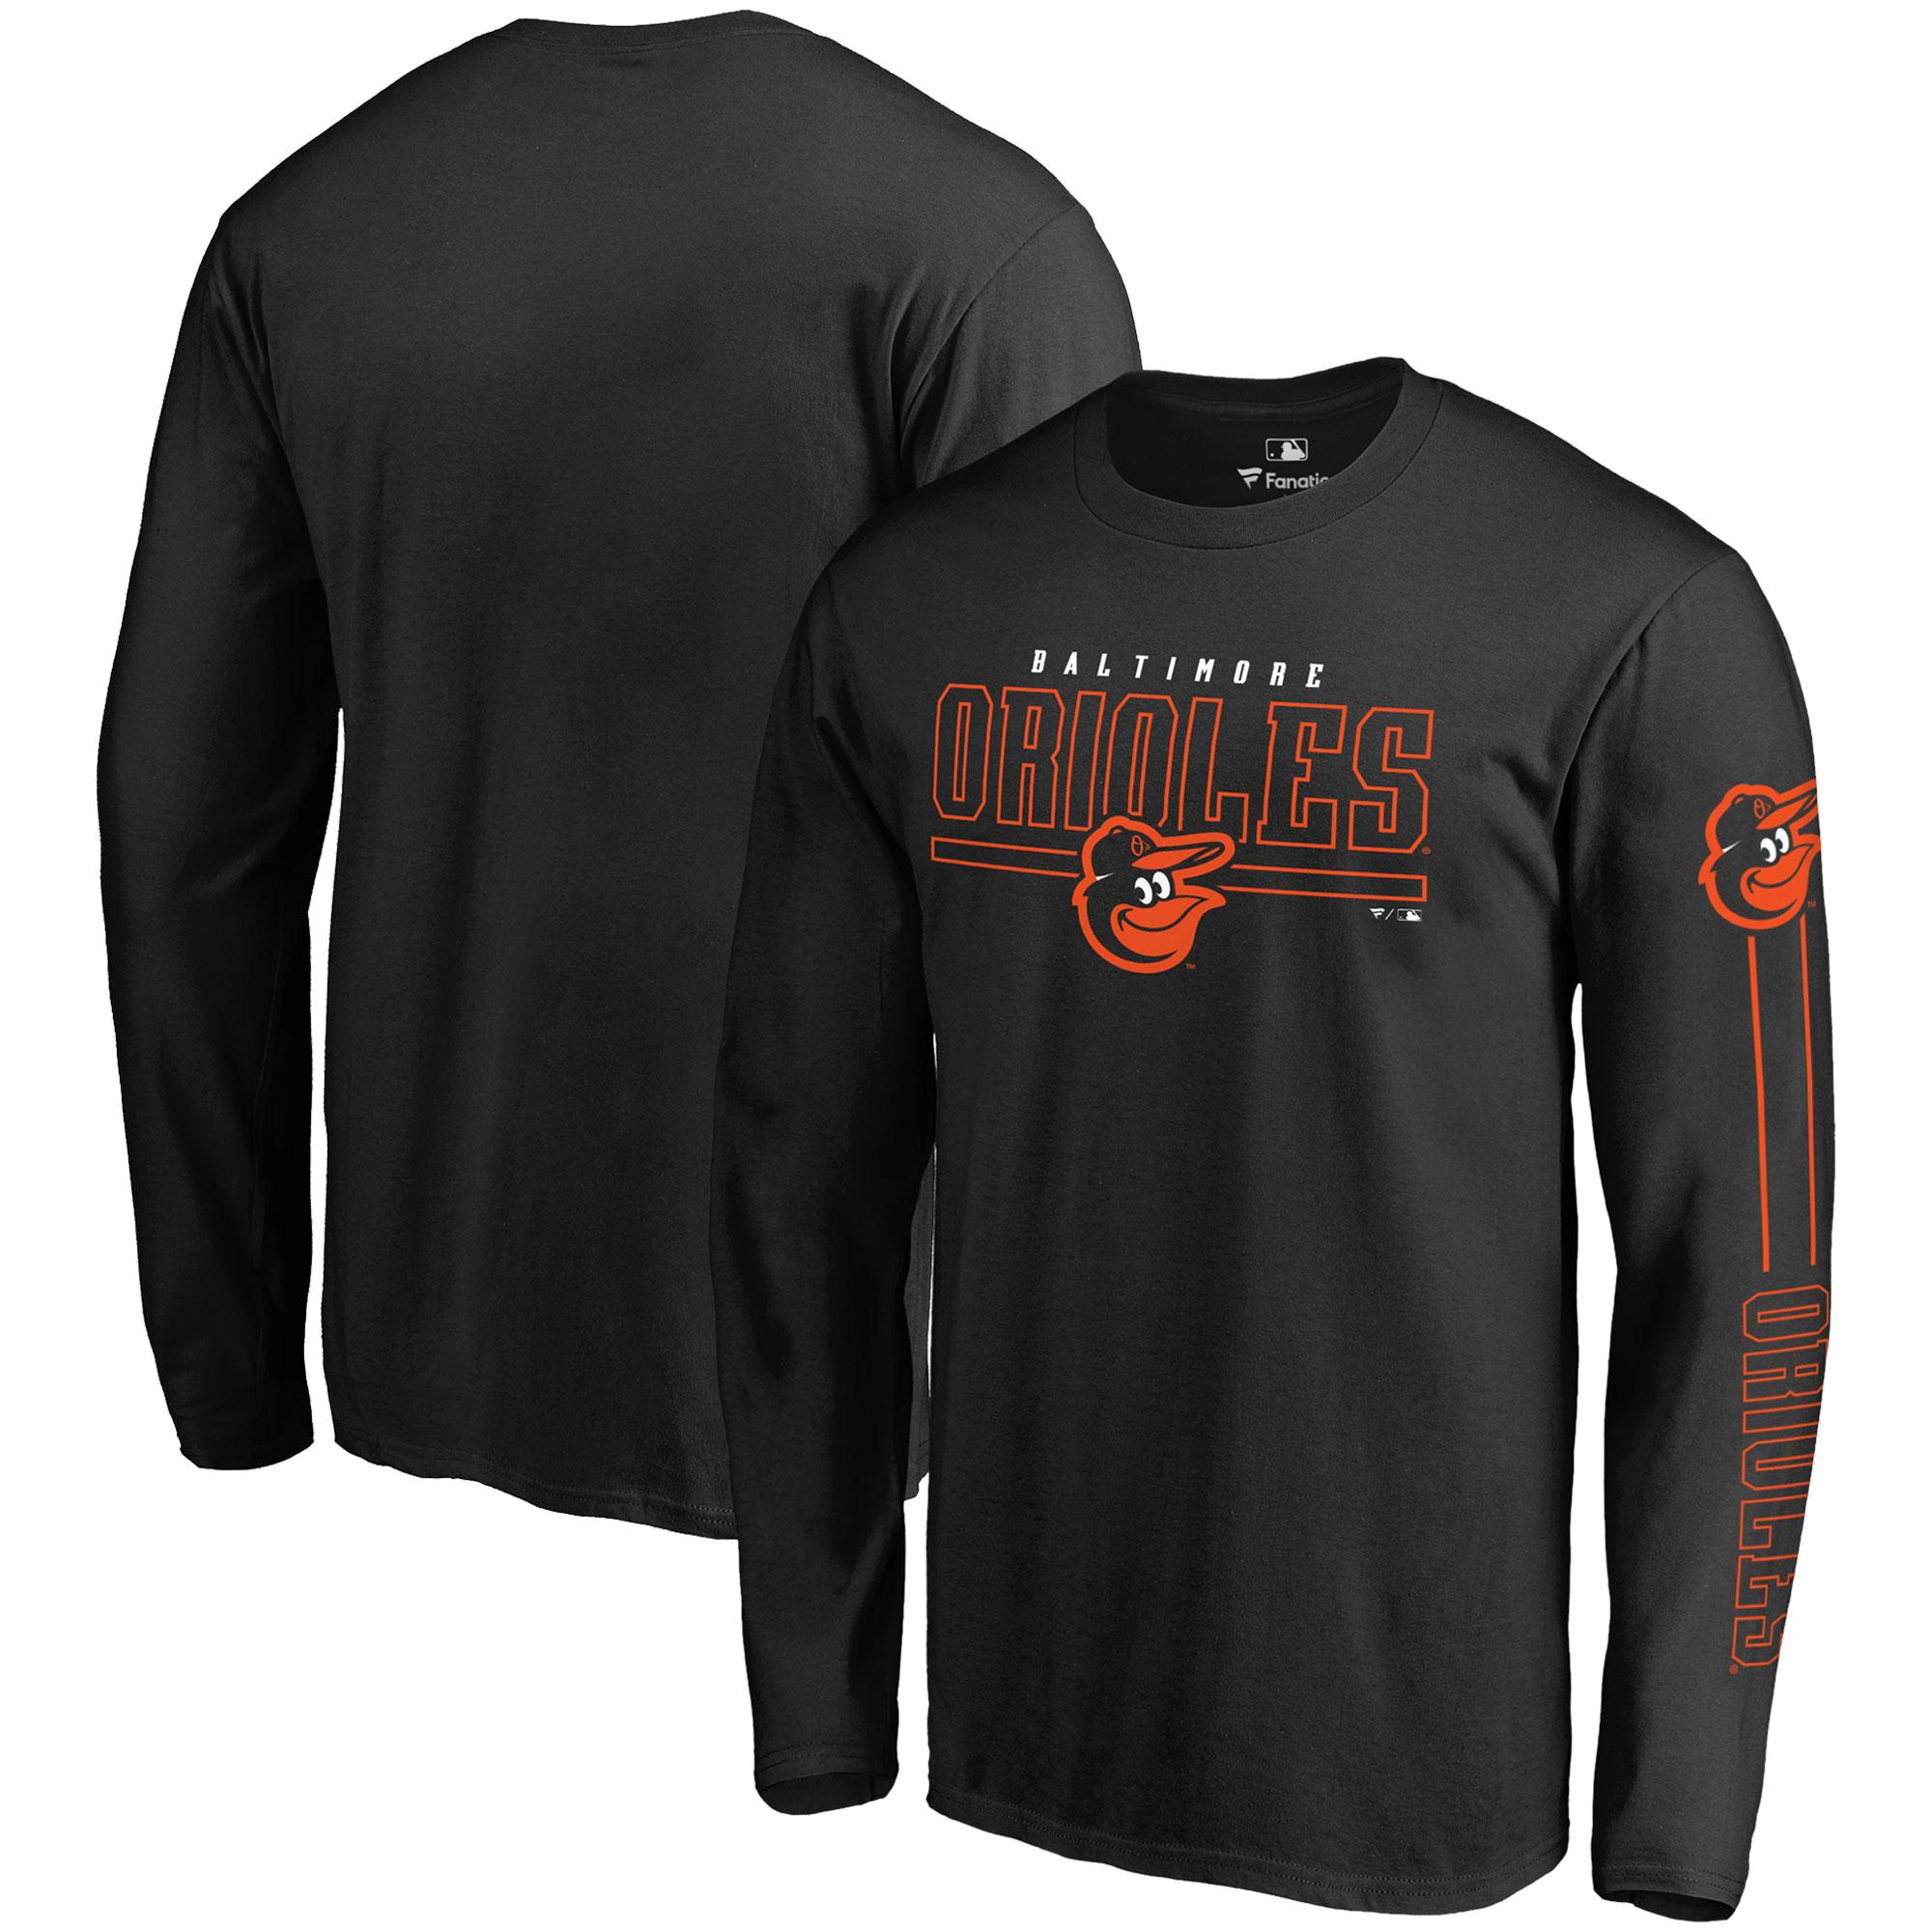 Baltimore Orioles Fanatics Branded Big & Tall Front Line Long Sleeve T-Shirt - Black